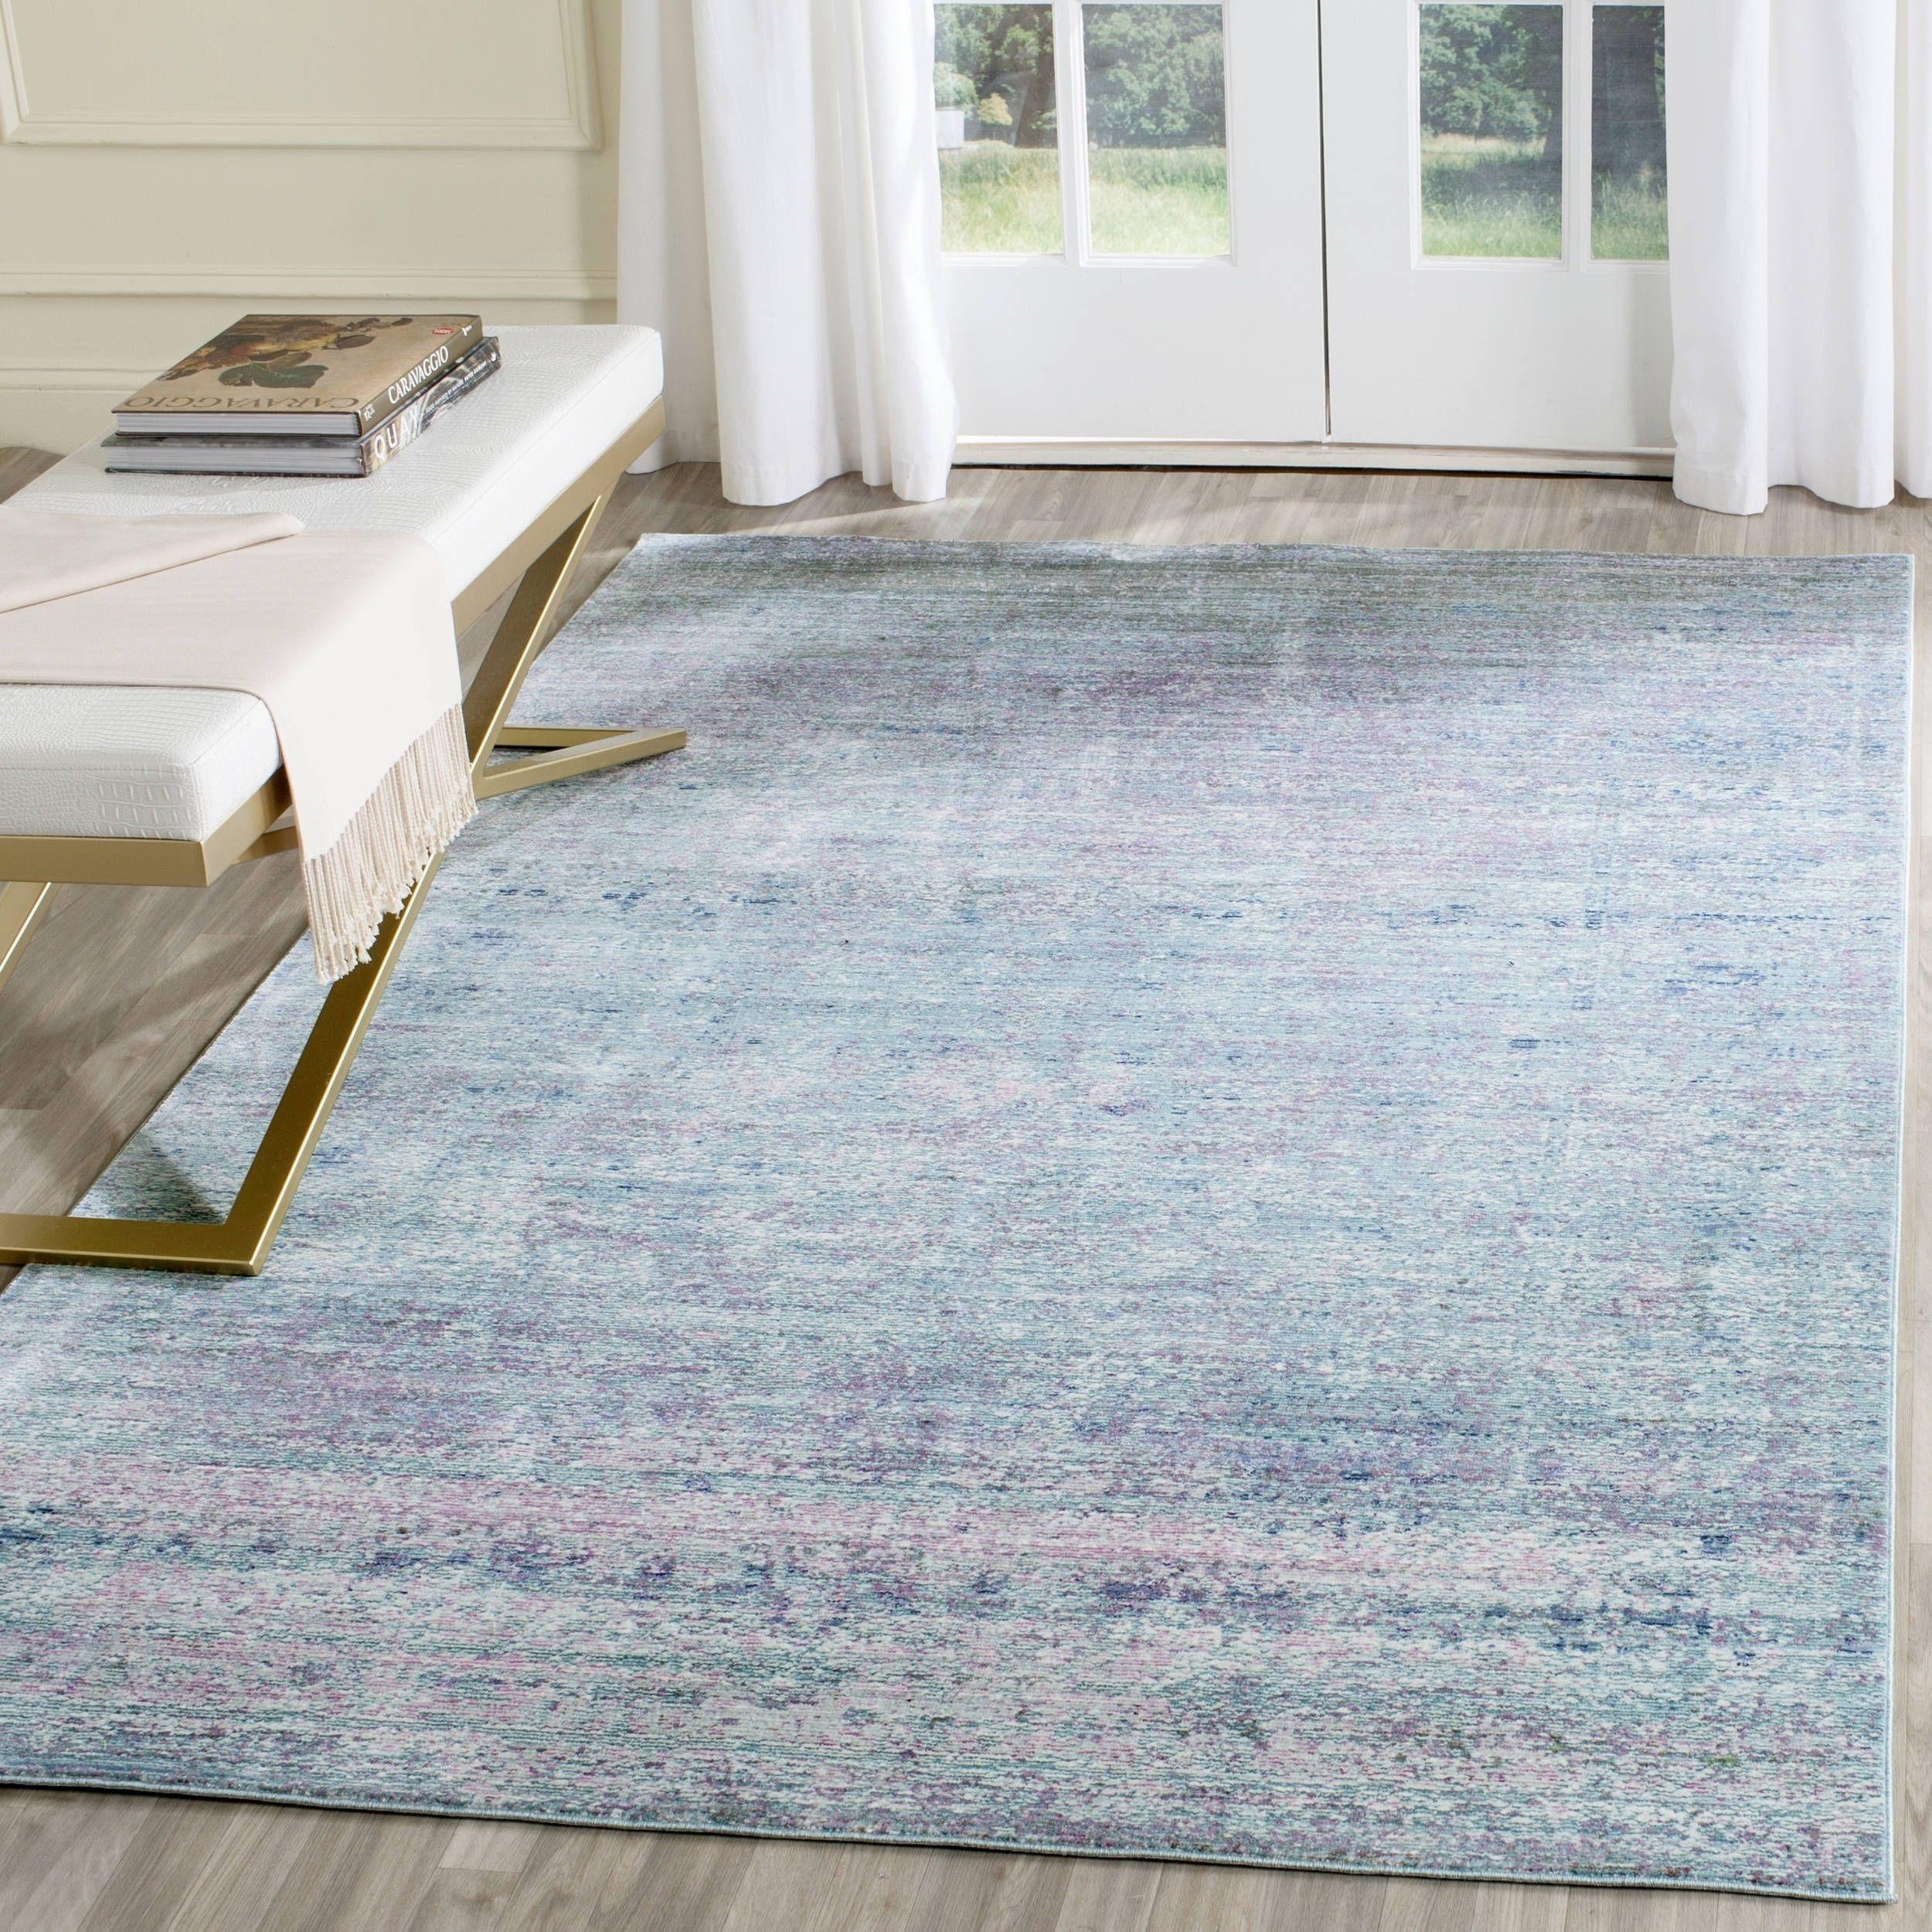 safavieh mystique watercolor purple multi distressed silky polyester rug 5u0027 x 8u0027 mys920k5 size 5u0027 x 8u0027